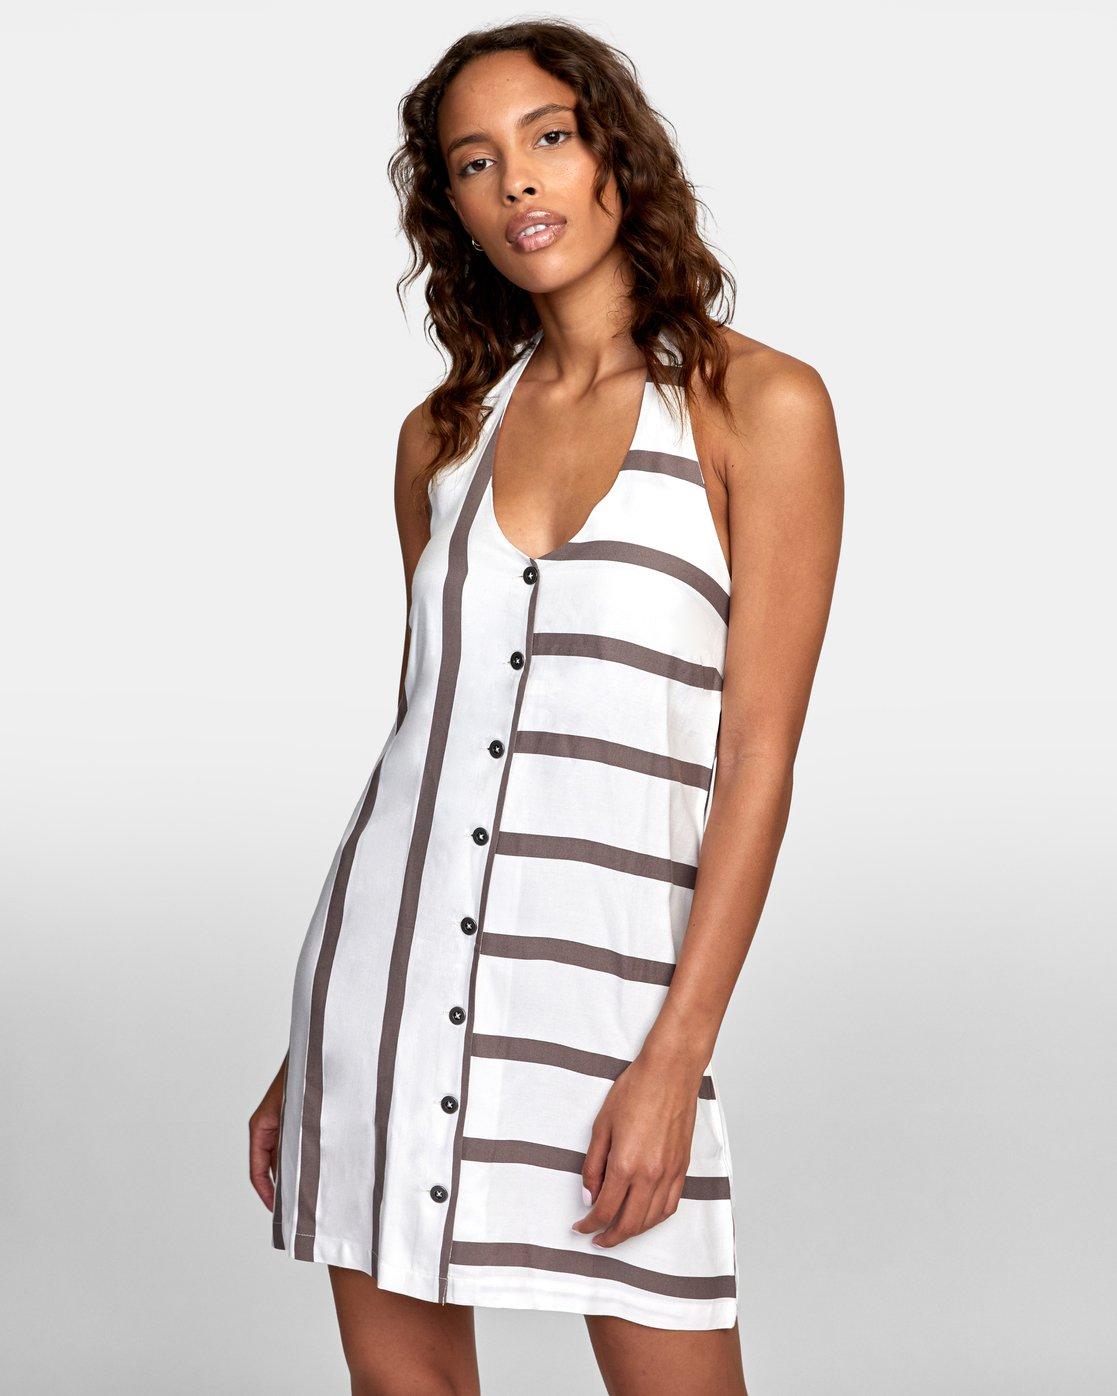 0 90s Baby Halter Dress White WD13TR90 RVCA